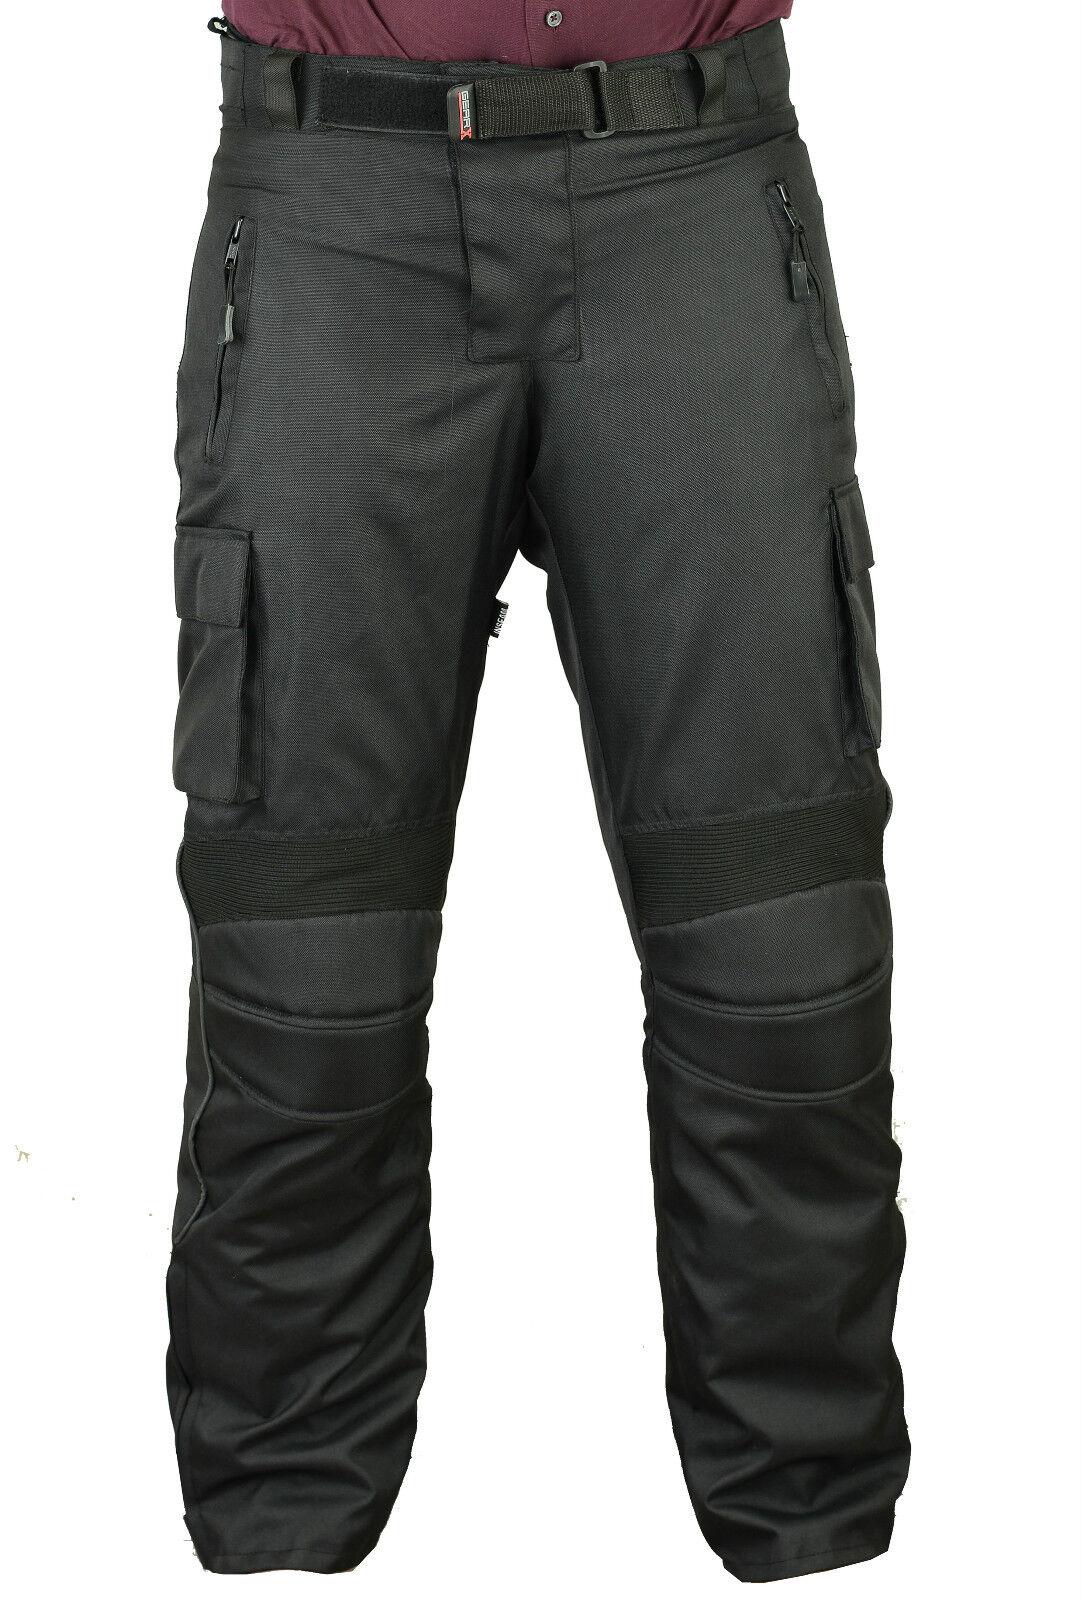 Gearx Impermeabili Motocicletta Pantaloni Uomo Protezione Pantaloni